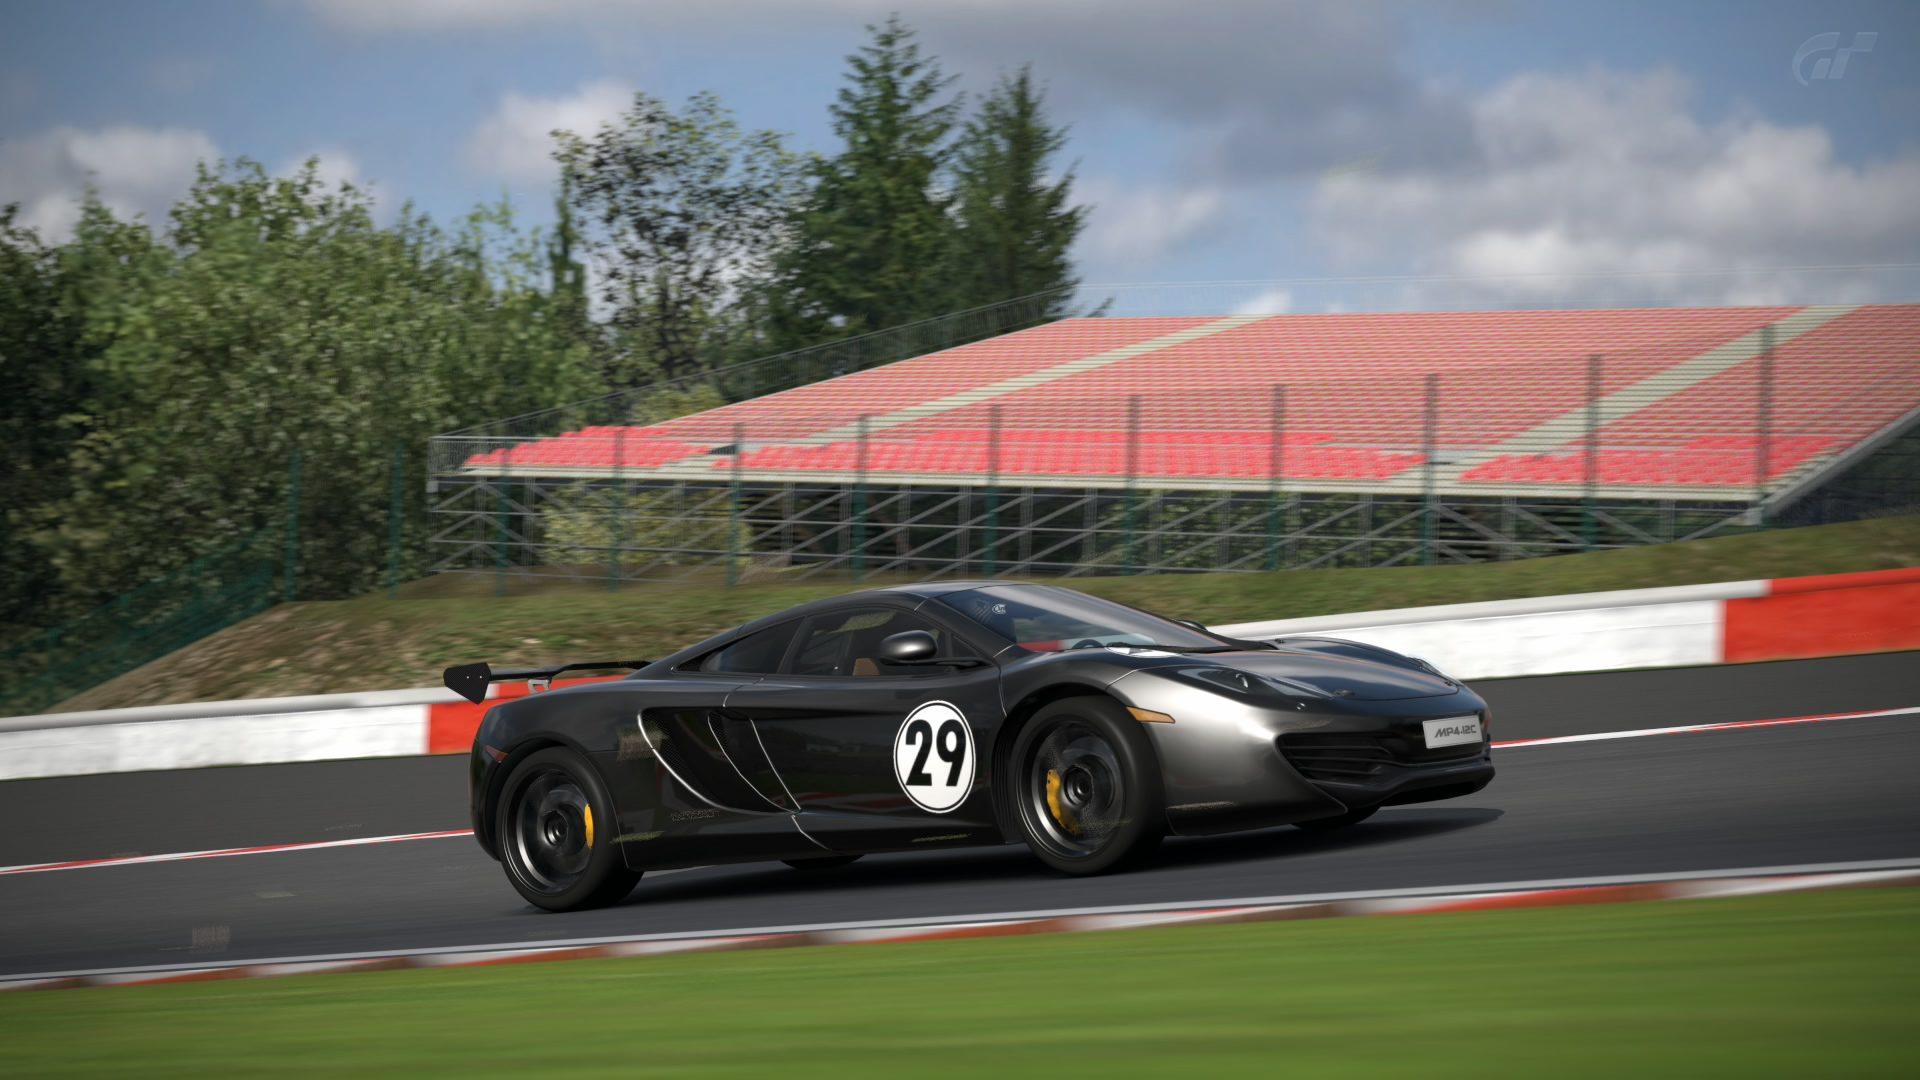 Circuit de Spa-Francorchamps_4 (2).jpg